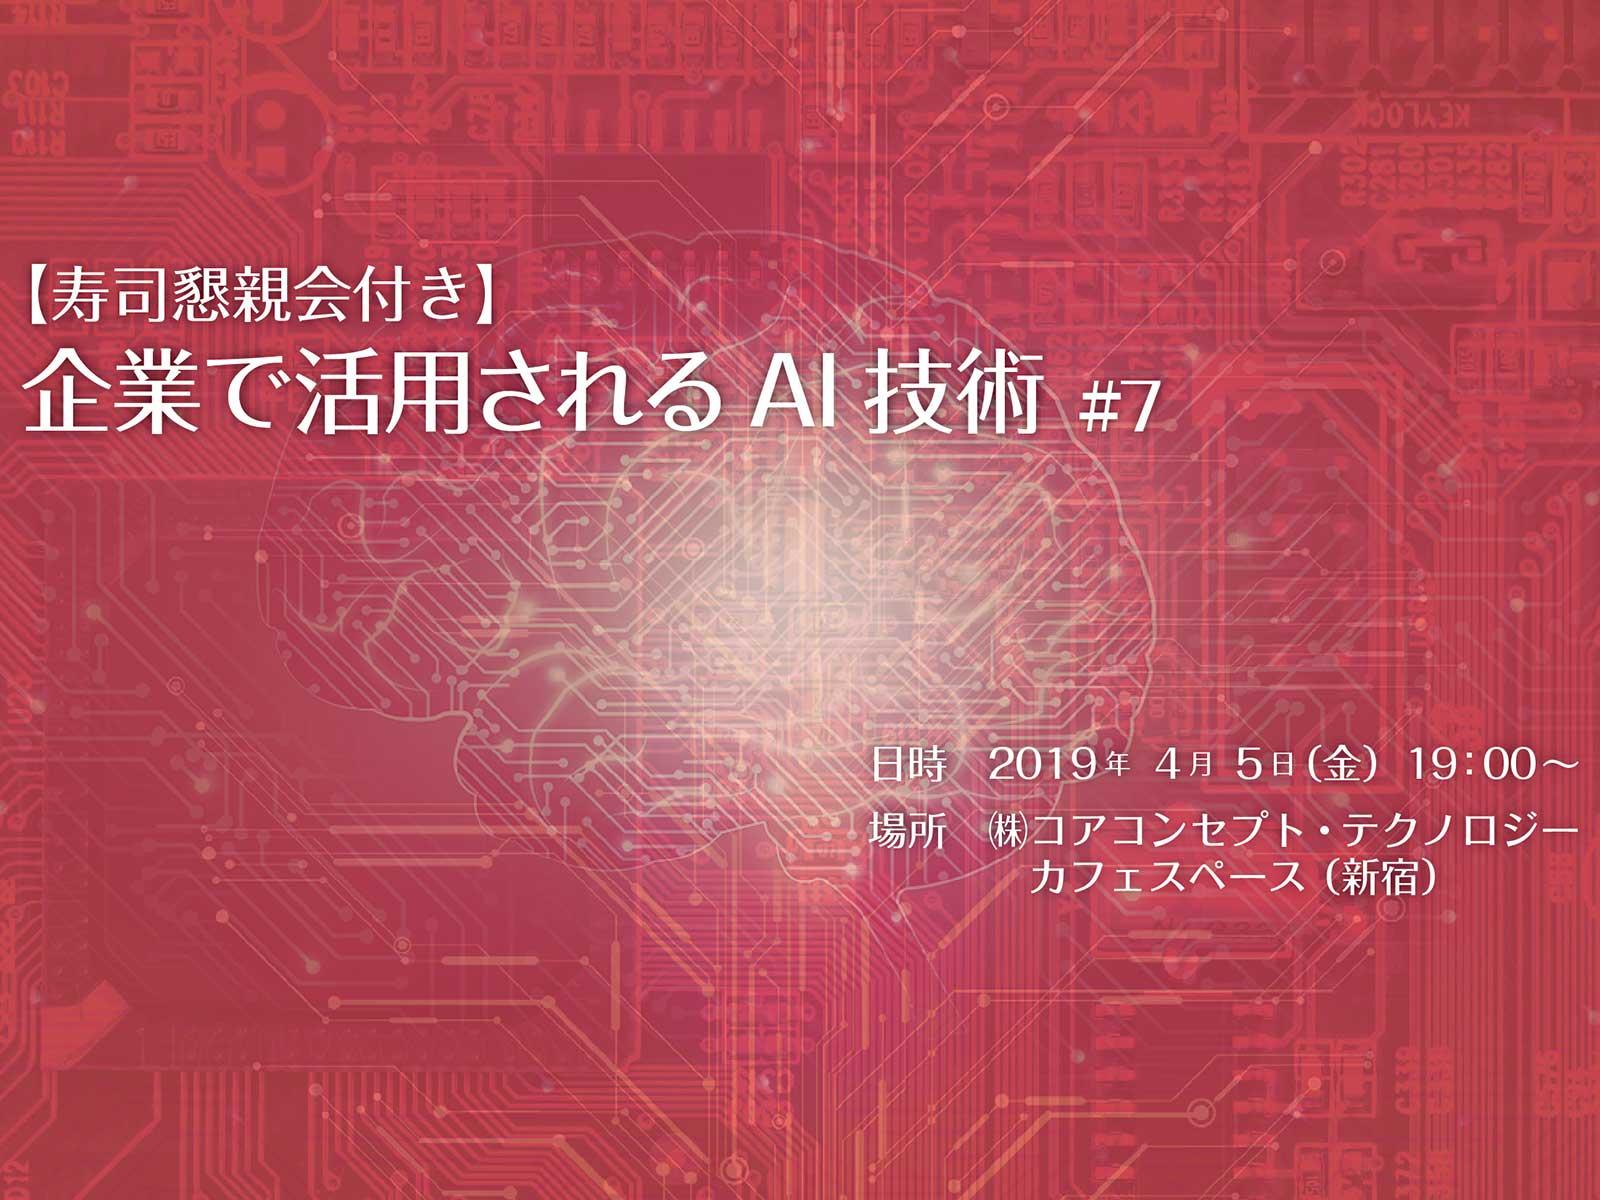 IoT/AIイベントを実施:【寿司懇親会付き】企業で活用されるAI技術 #7